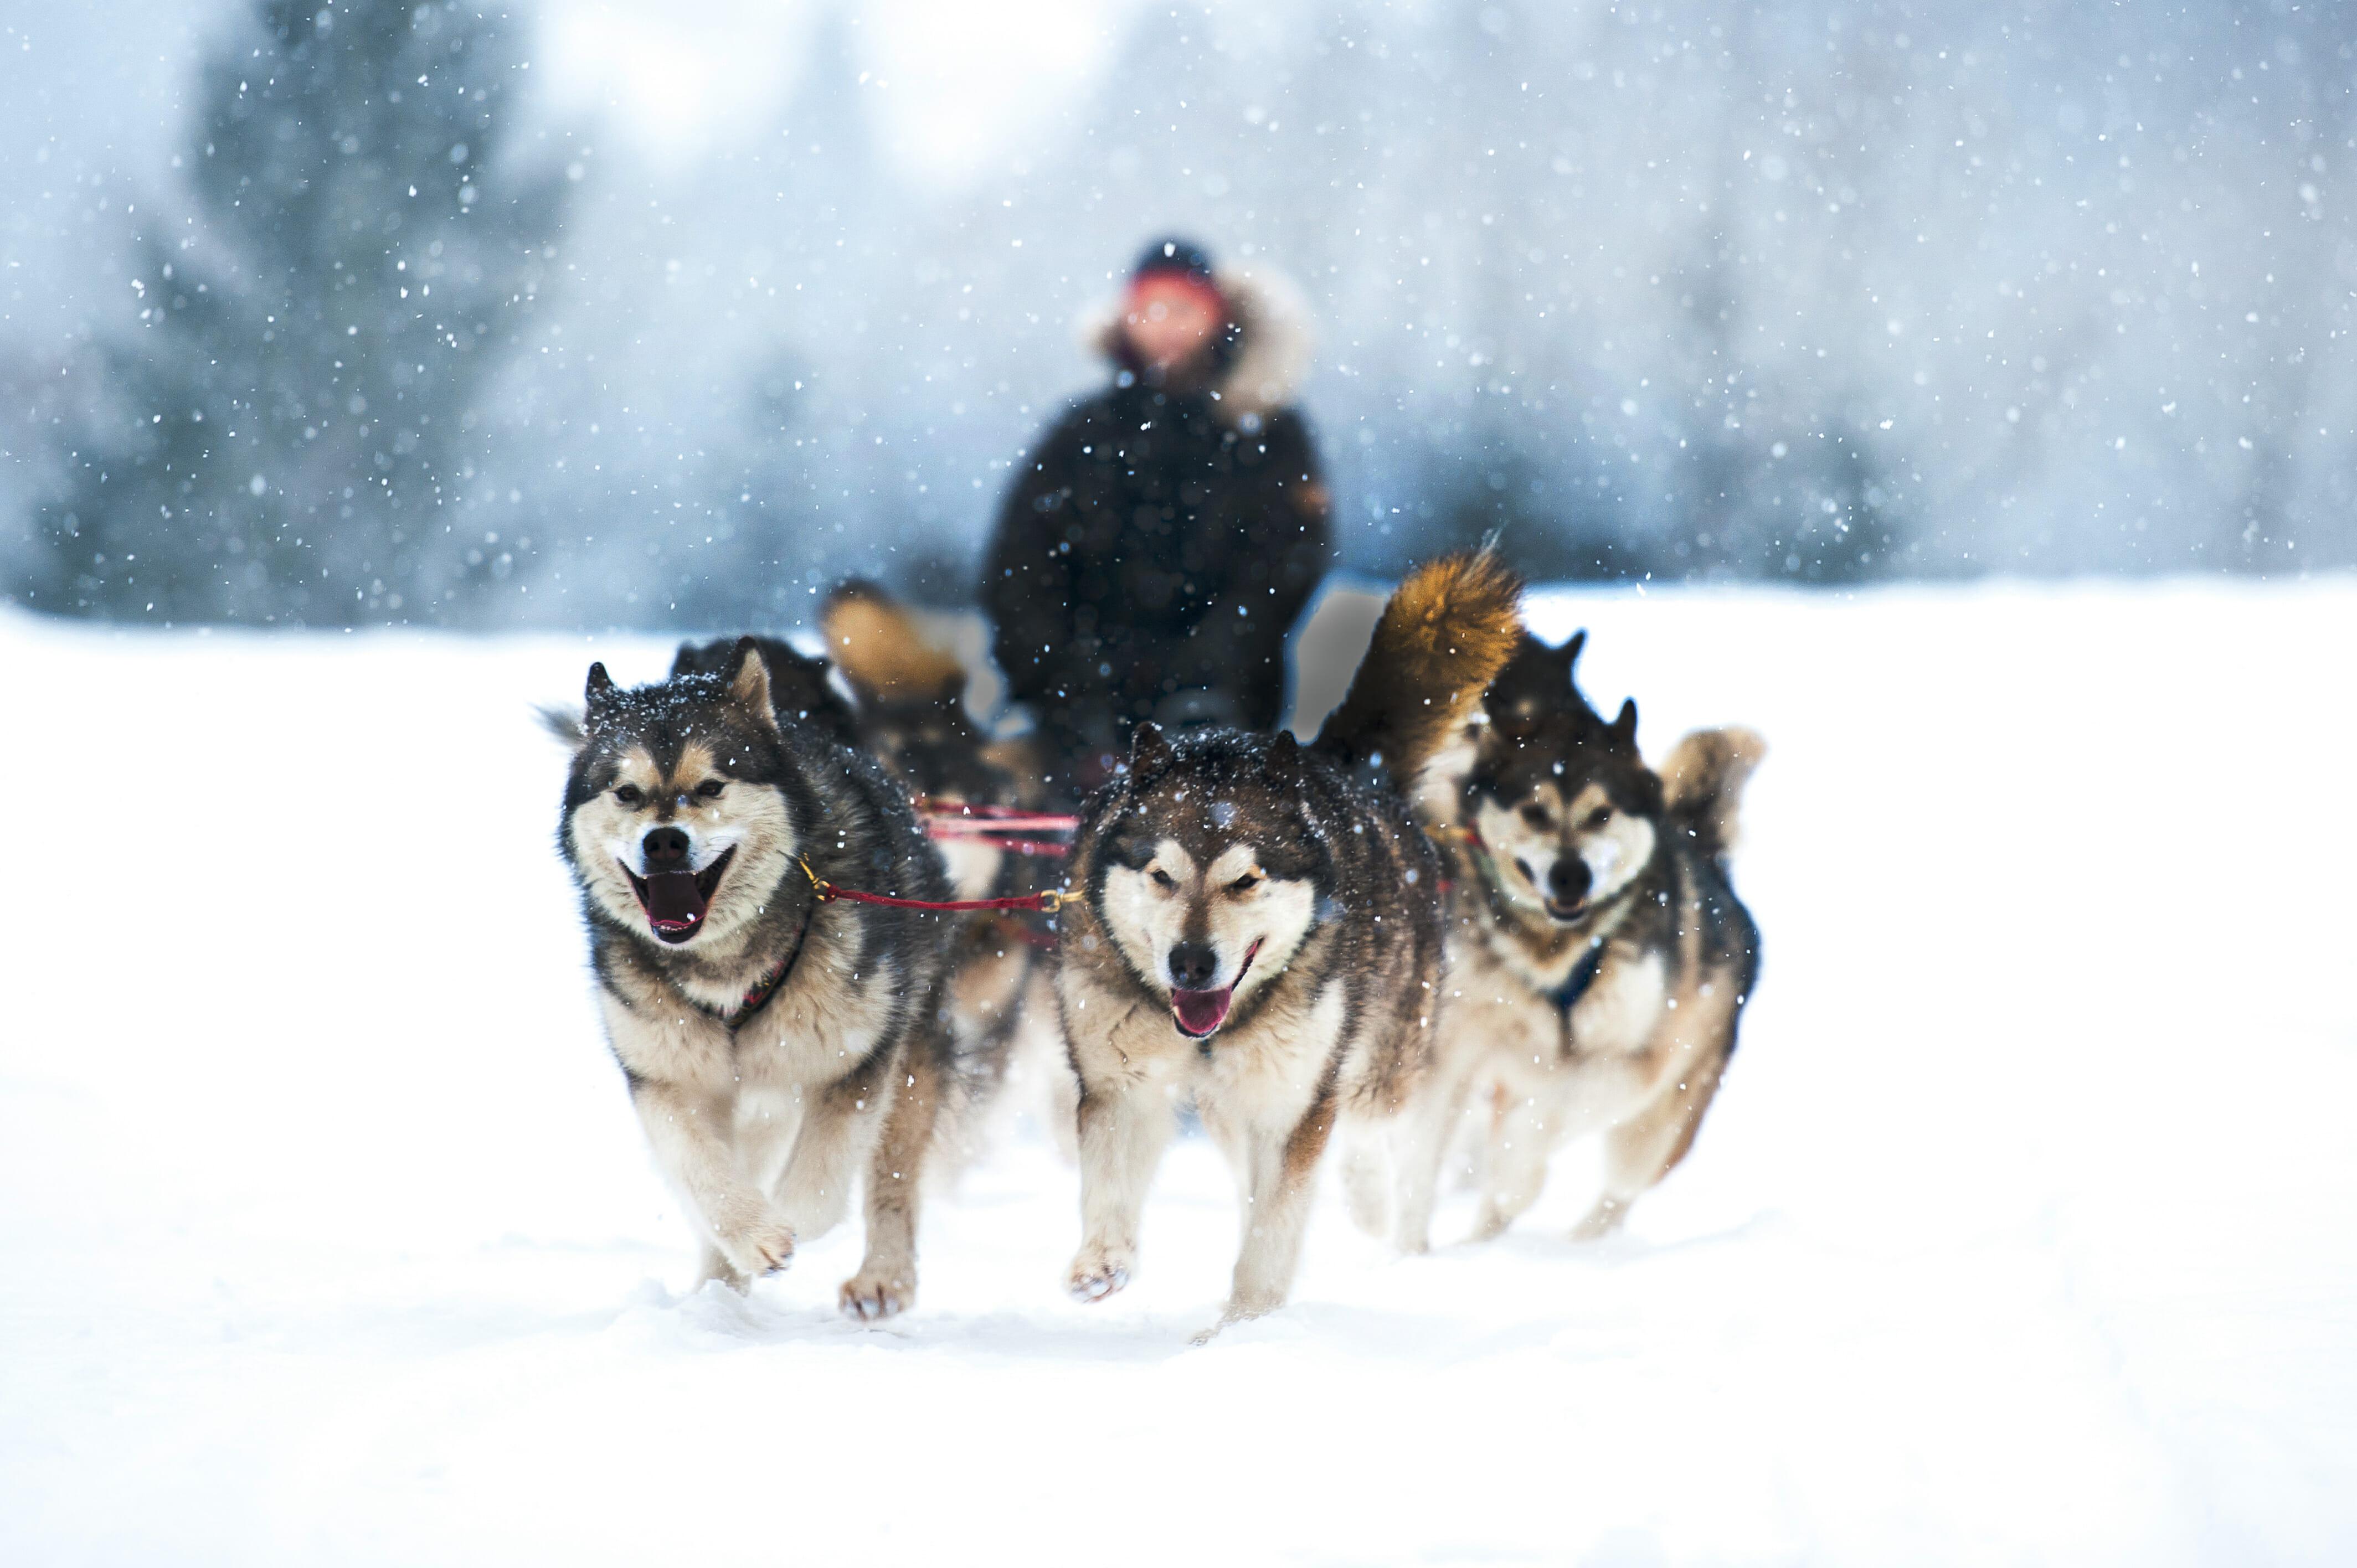 2-RESIZED-dog-sledding-wint-darkened-shutterstock_478700209